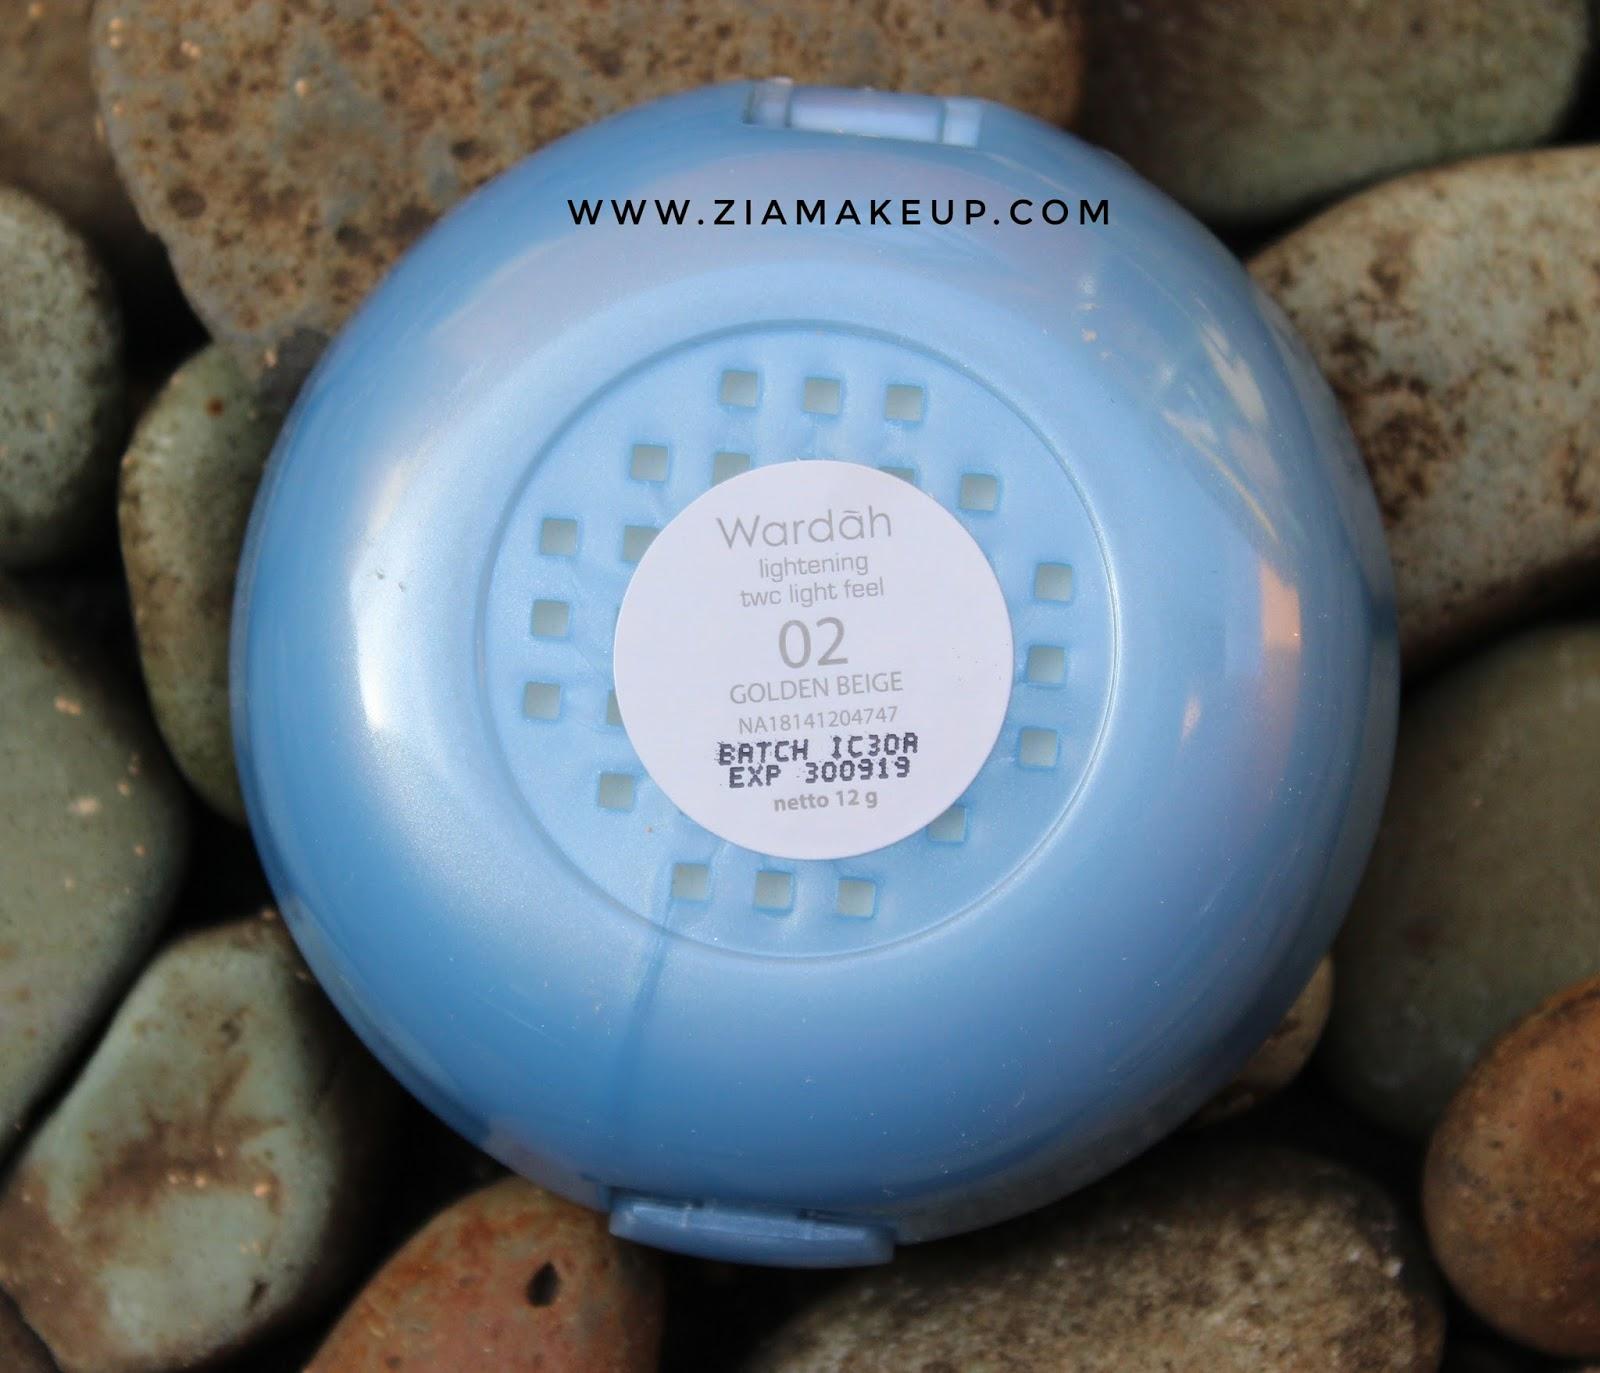 Review Wardah Lightening Two Way Cake Ziamakeup Warda Luminous Berwarna Biru Dengan Label Di Bagian Depannya Warnanya Cantik Banget Ciri Khas